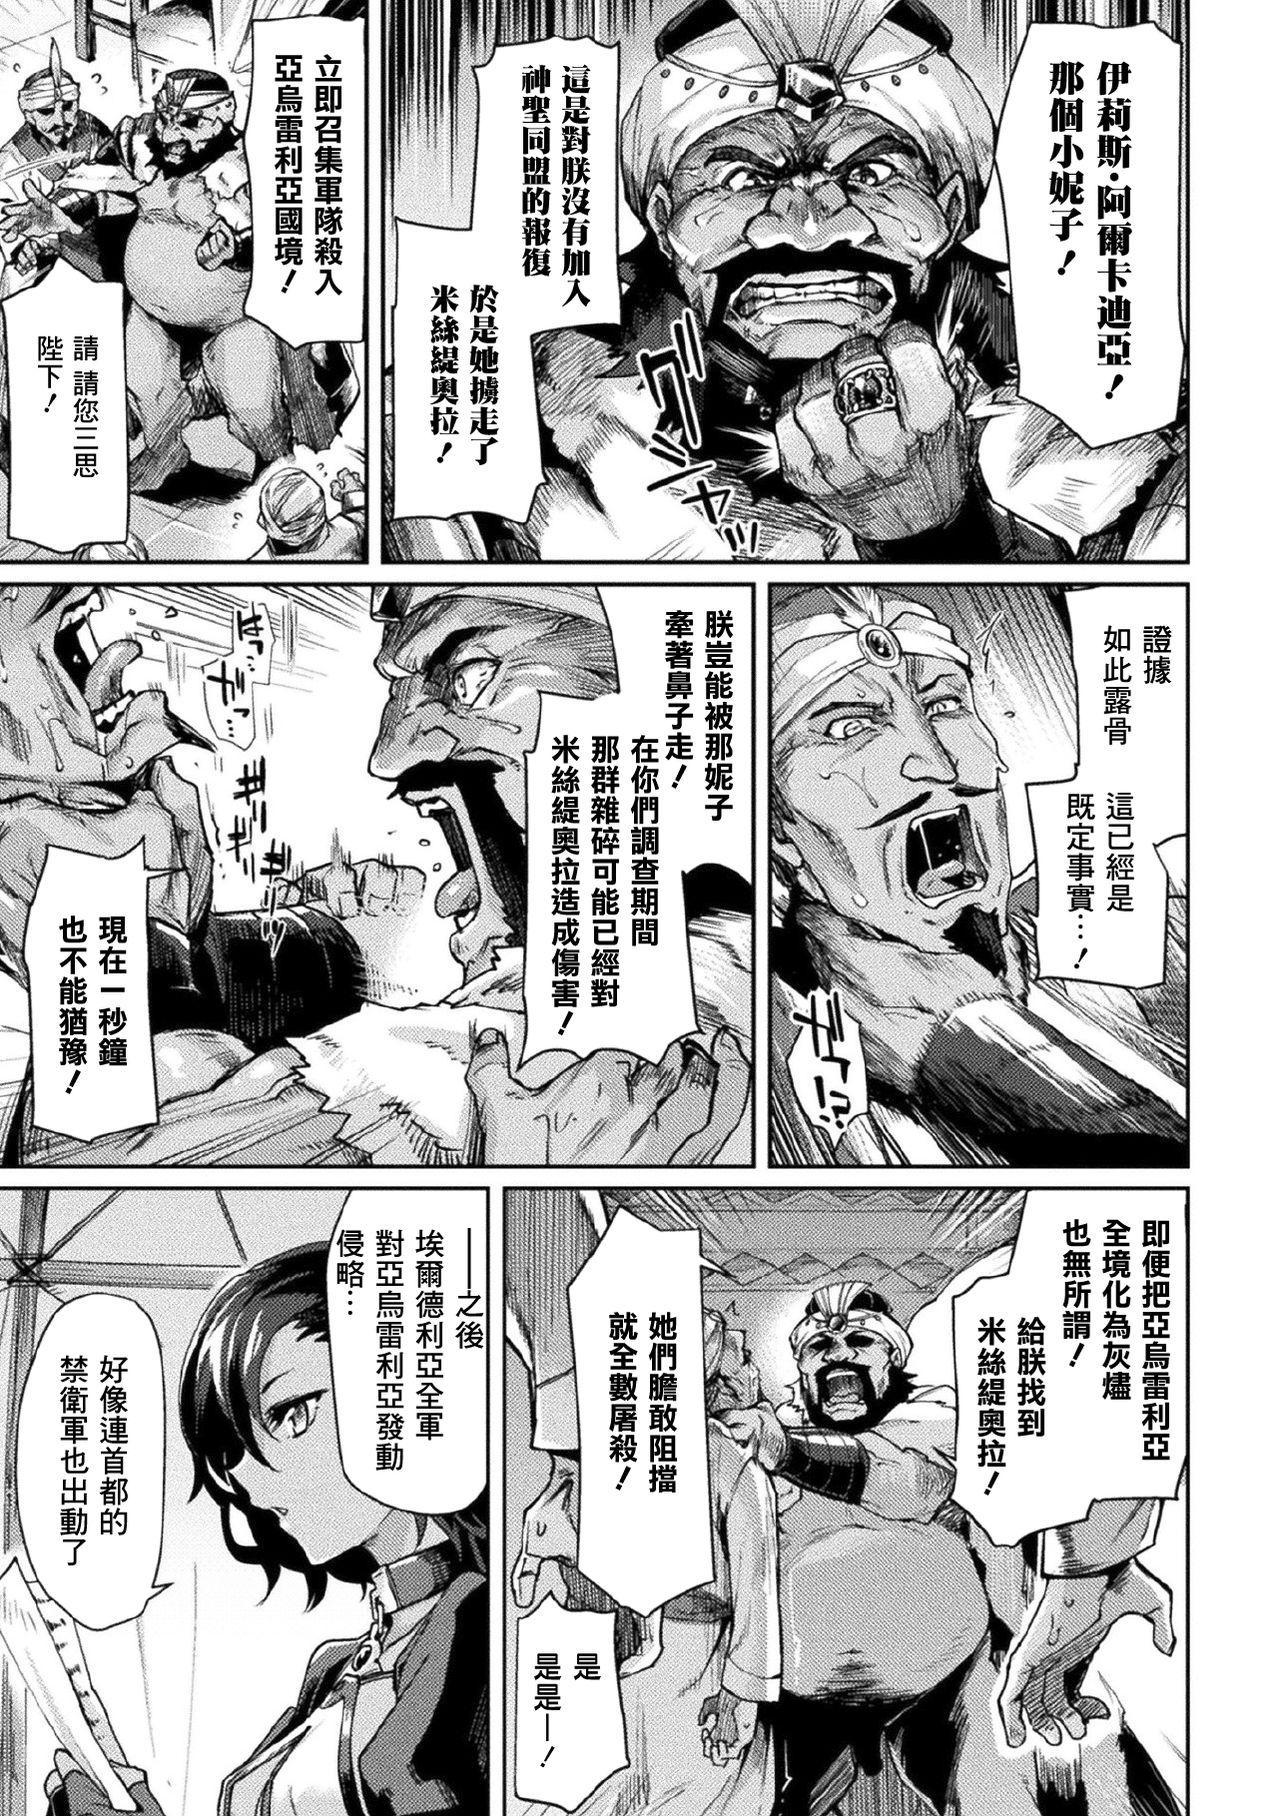 [Tsukitokage] Kuroinu II ~Inyoku ni Somaru Haitoku no Miyako, Futatabi~ THE COMIC Chapter 6 (Kukkoro Heroines Vol. 7) [Digital] [Chinese] [鬼畜王漢化組] [Digital] 5